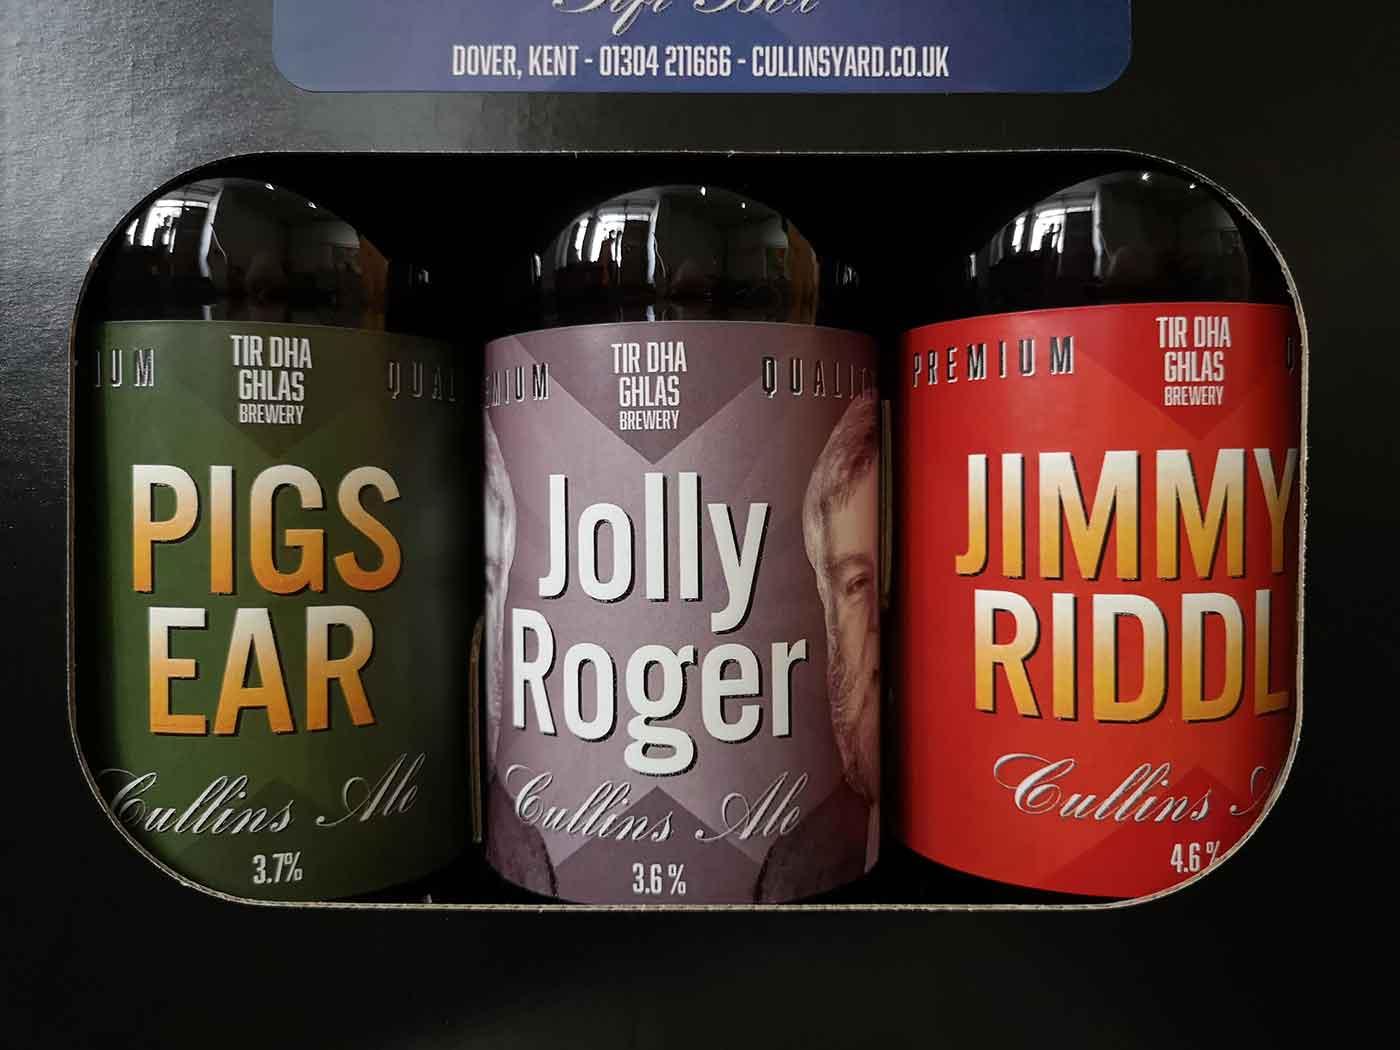 c brewery giftbox 4